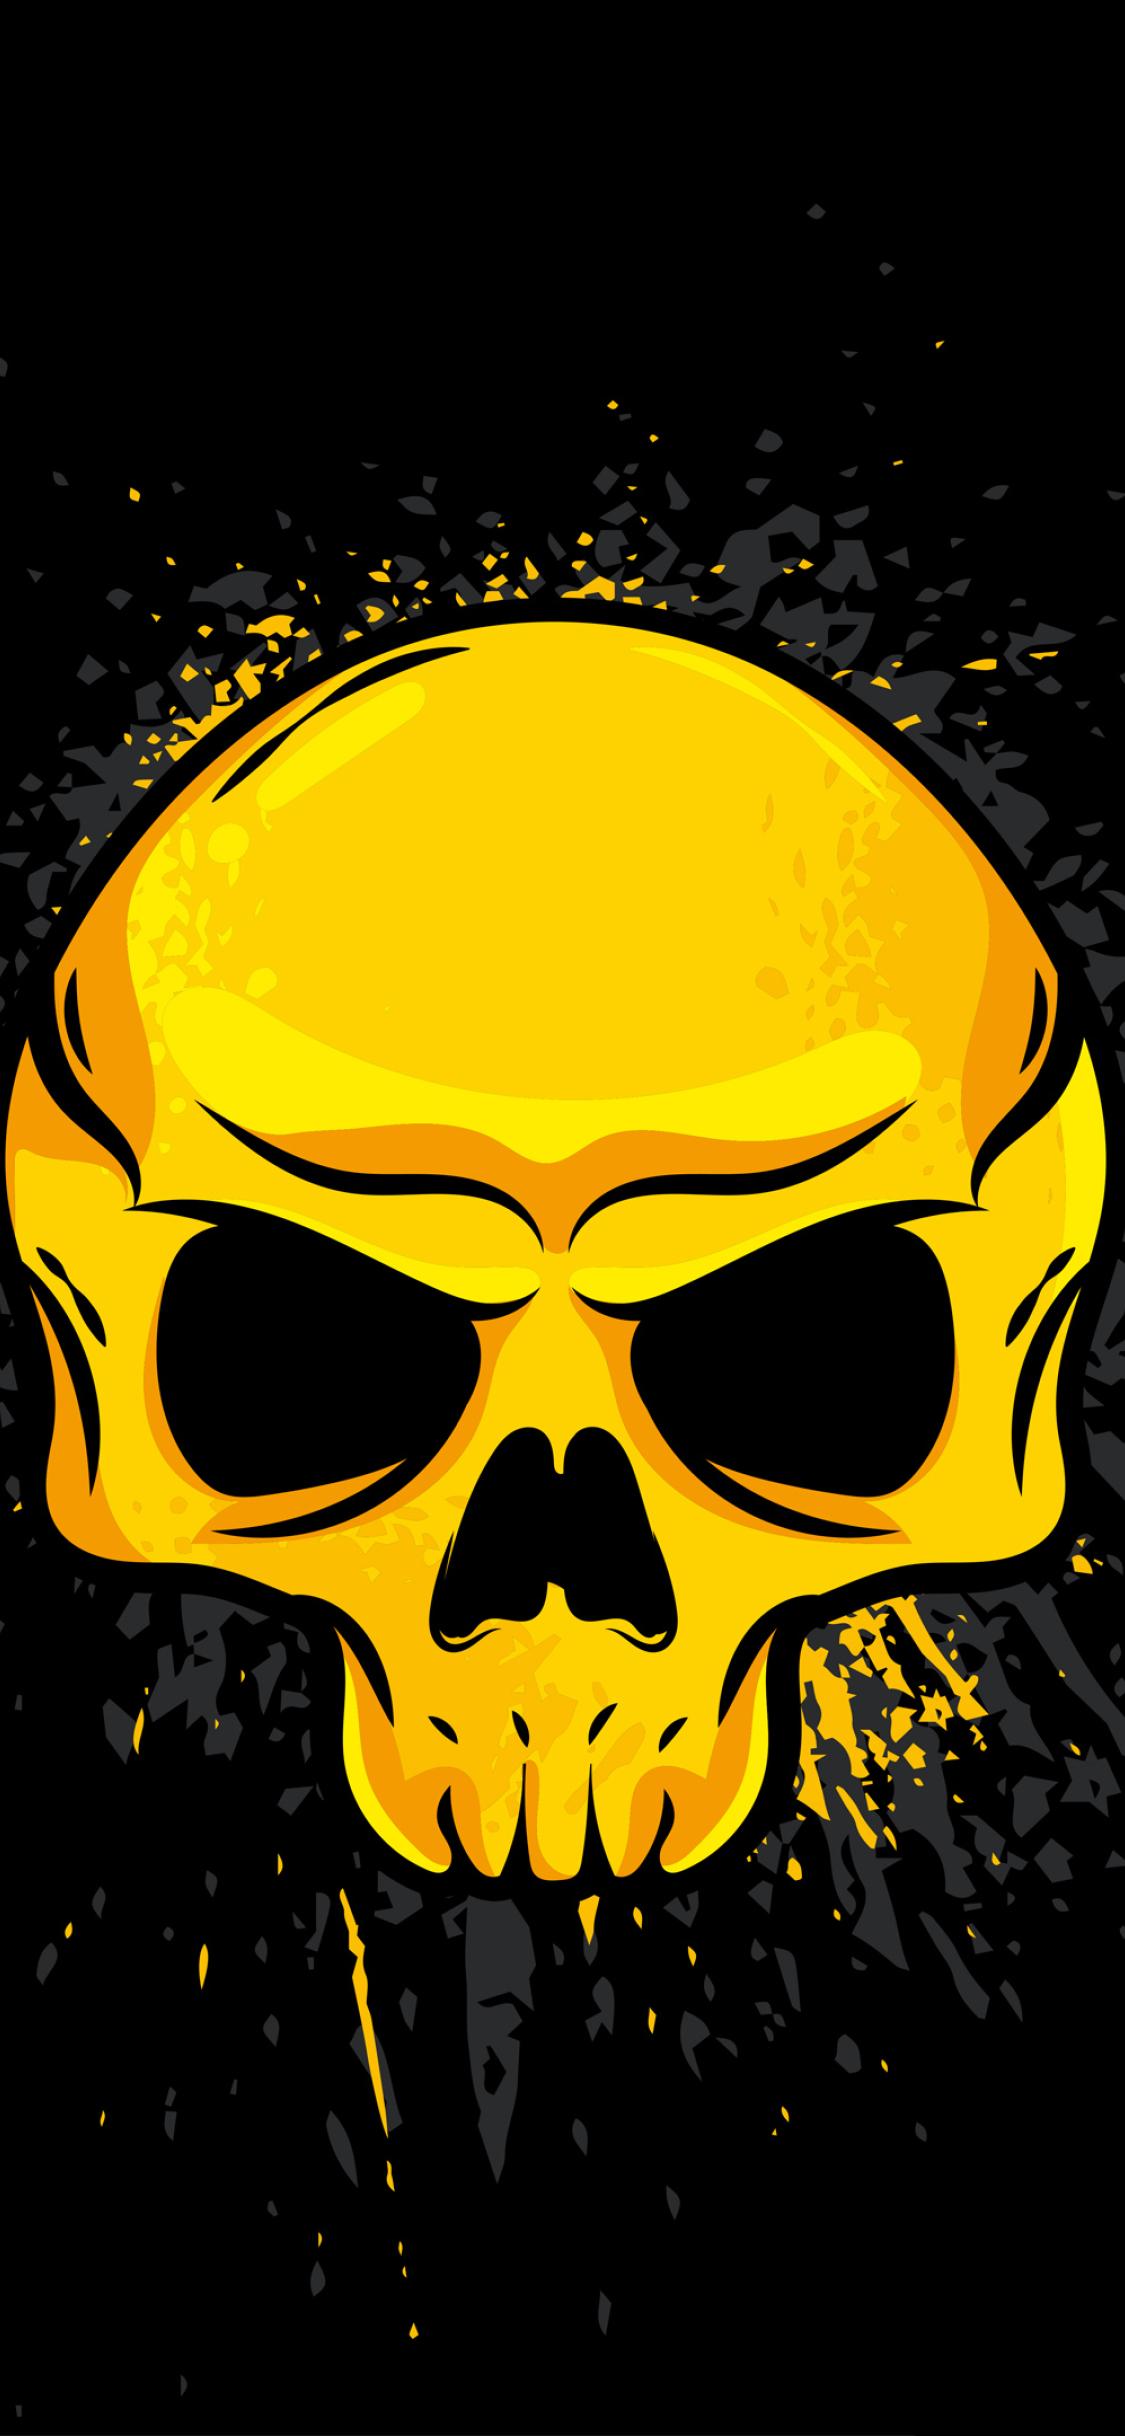 1125x2436 4K Gold Skull Iphone XS,Iphone 10,Iphone X ...